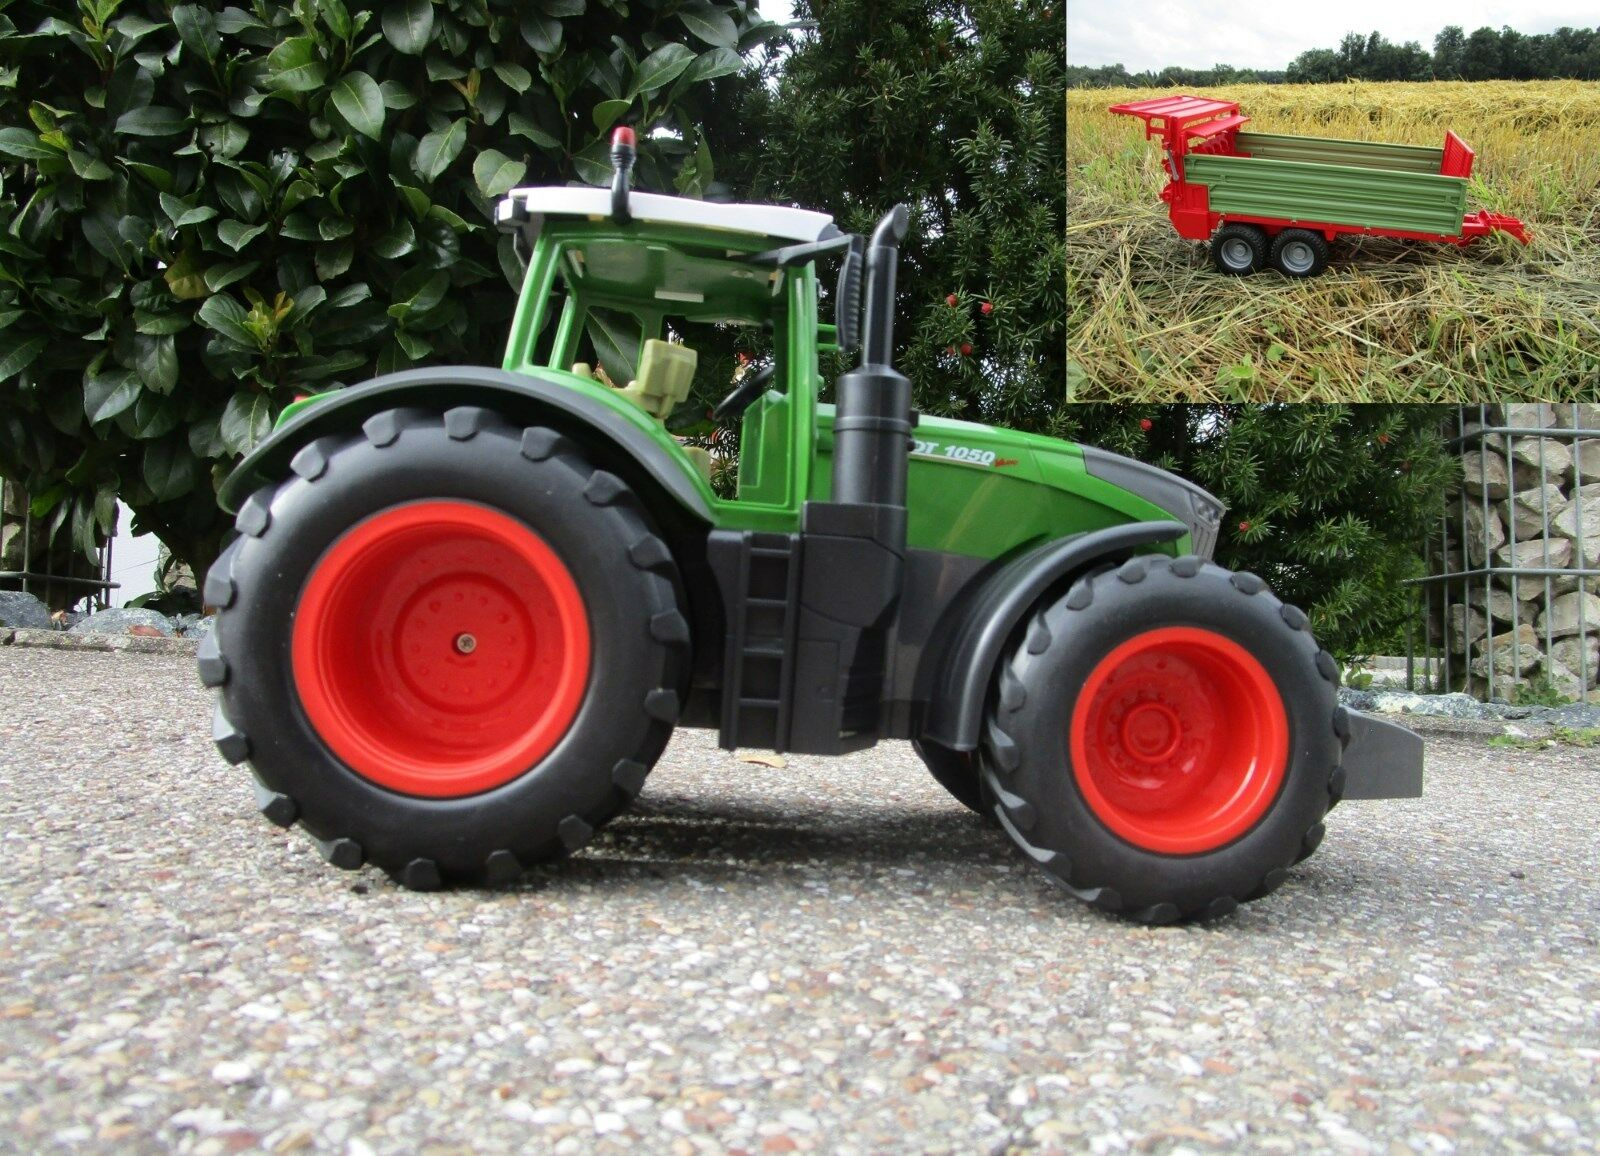 2RC Traktor Fendt 1050 Vario mit Anhänger-Stalldungstreuer 1 16  Top  405035-H 1